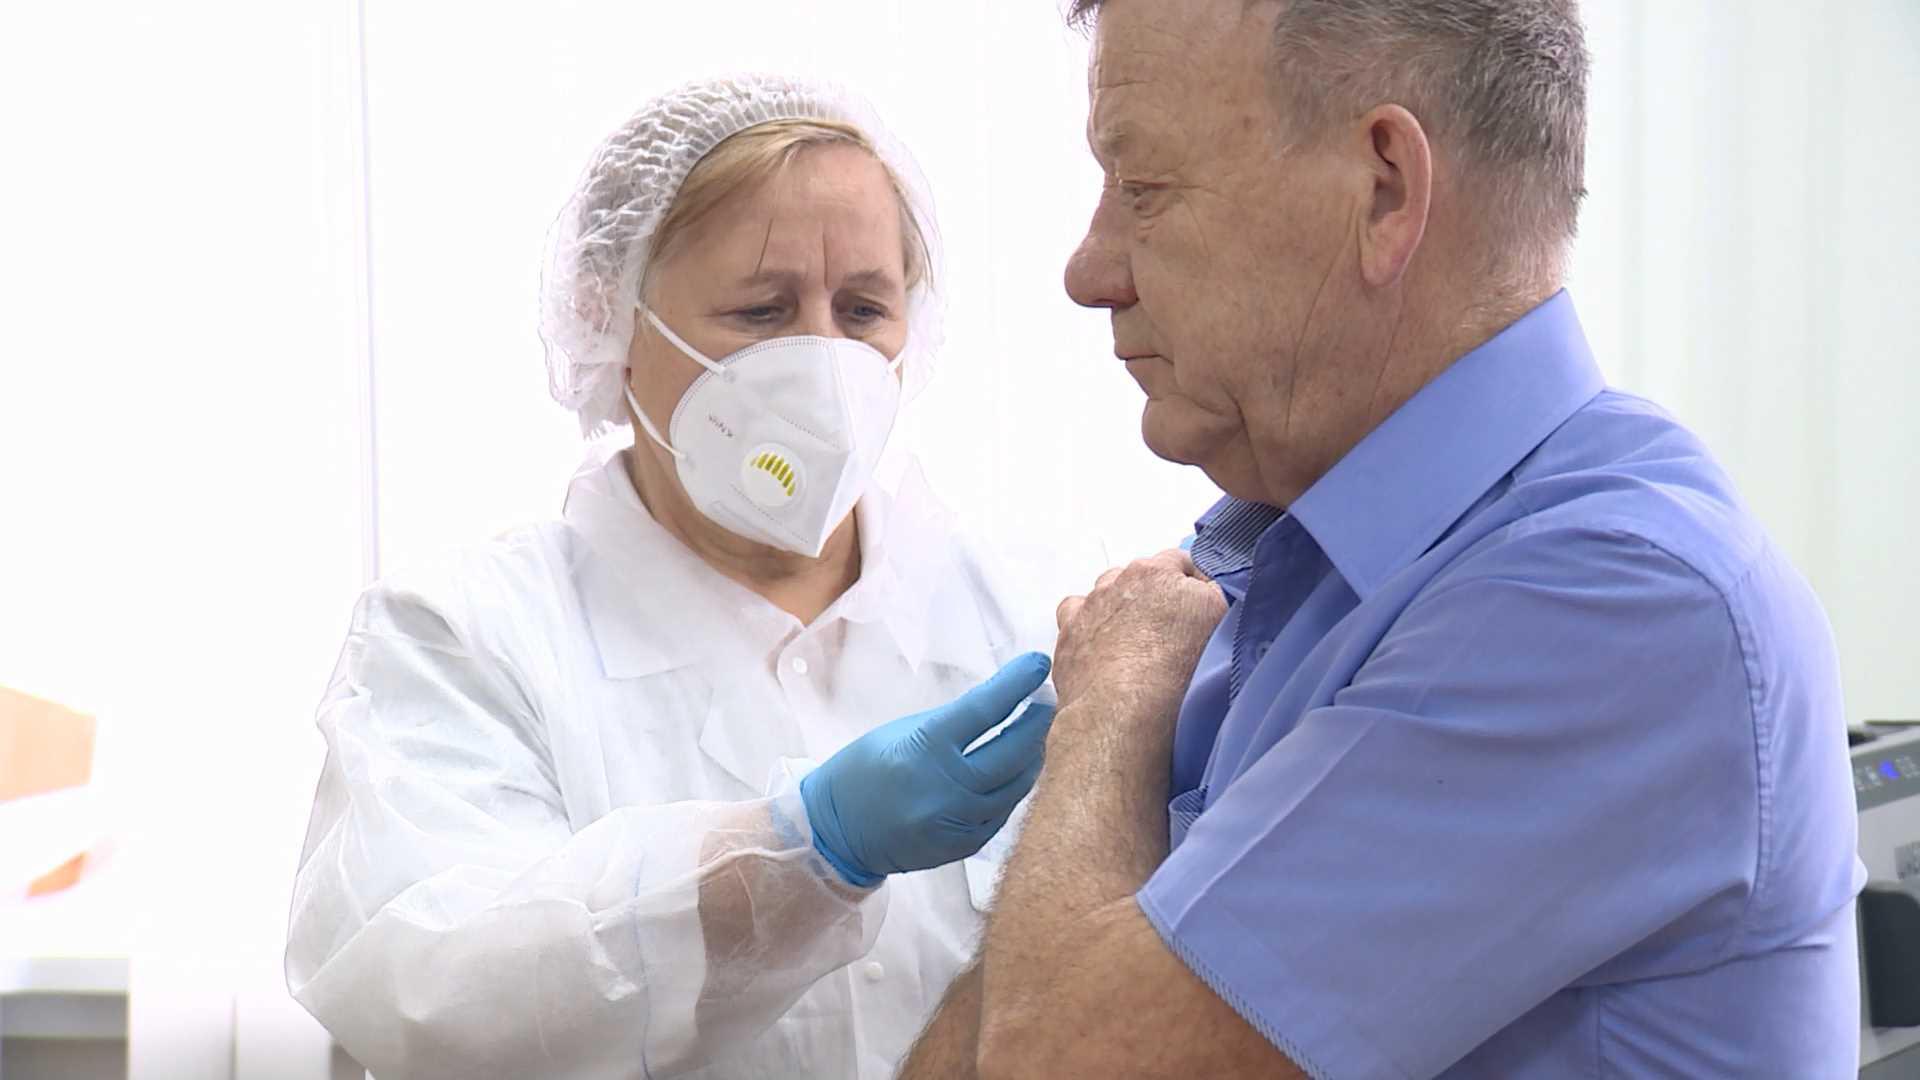 Депздрав: прививки от коронавируса сделали 11 тысяч костромичей